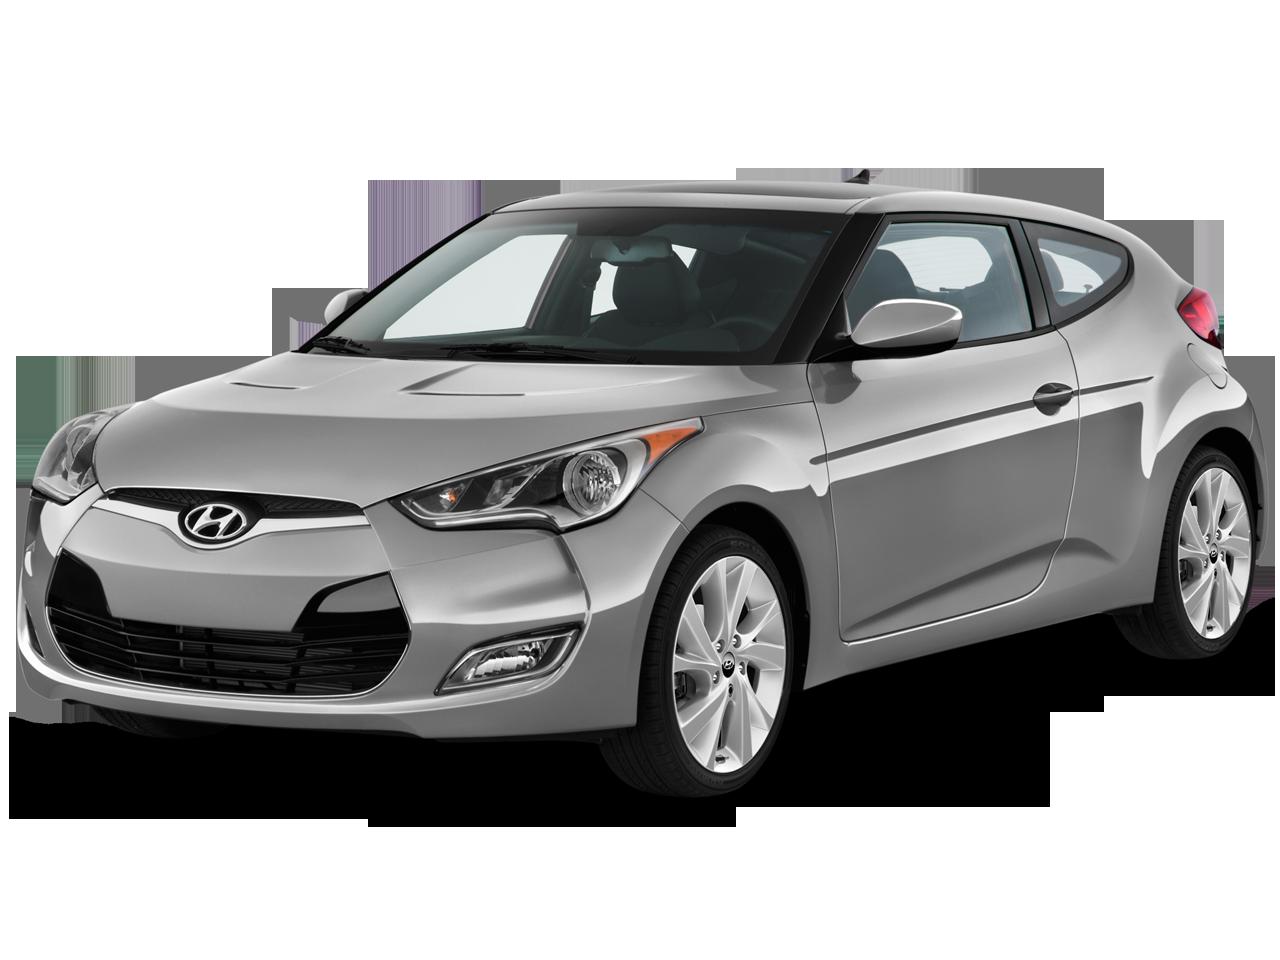 Hyundai kia motor finance company retail - New 2017 Hyundai Veloster Dual Clutch